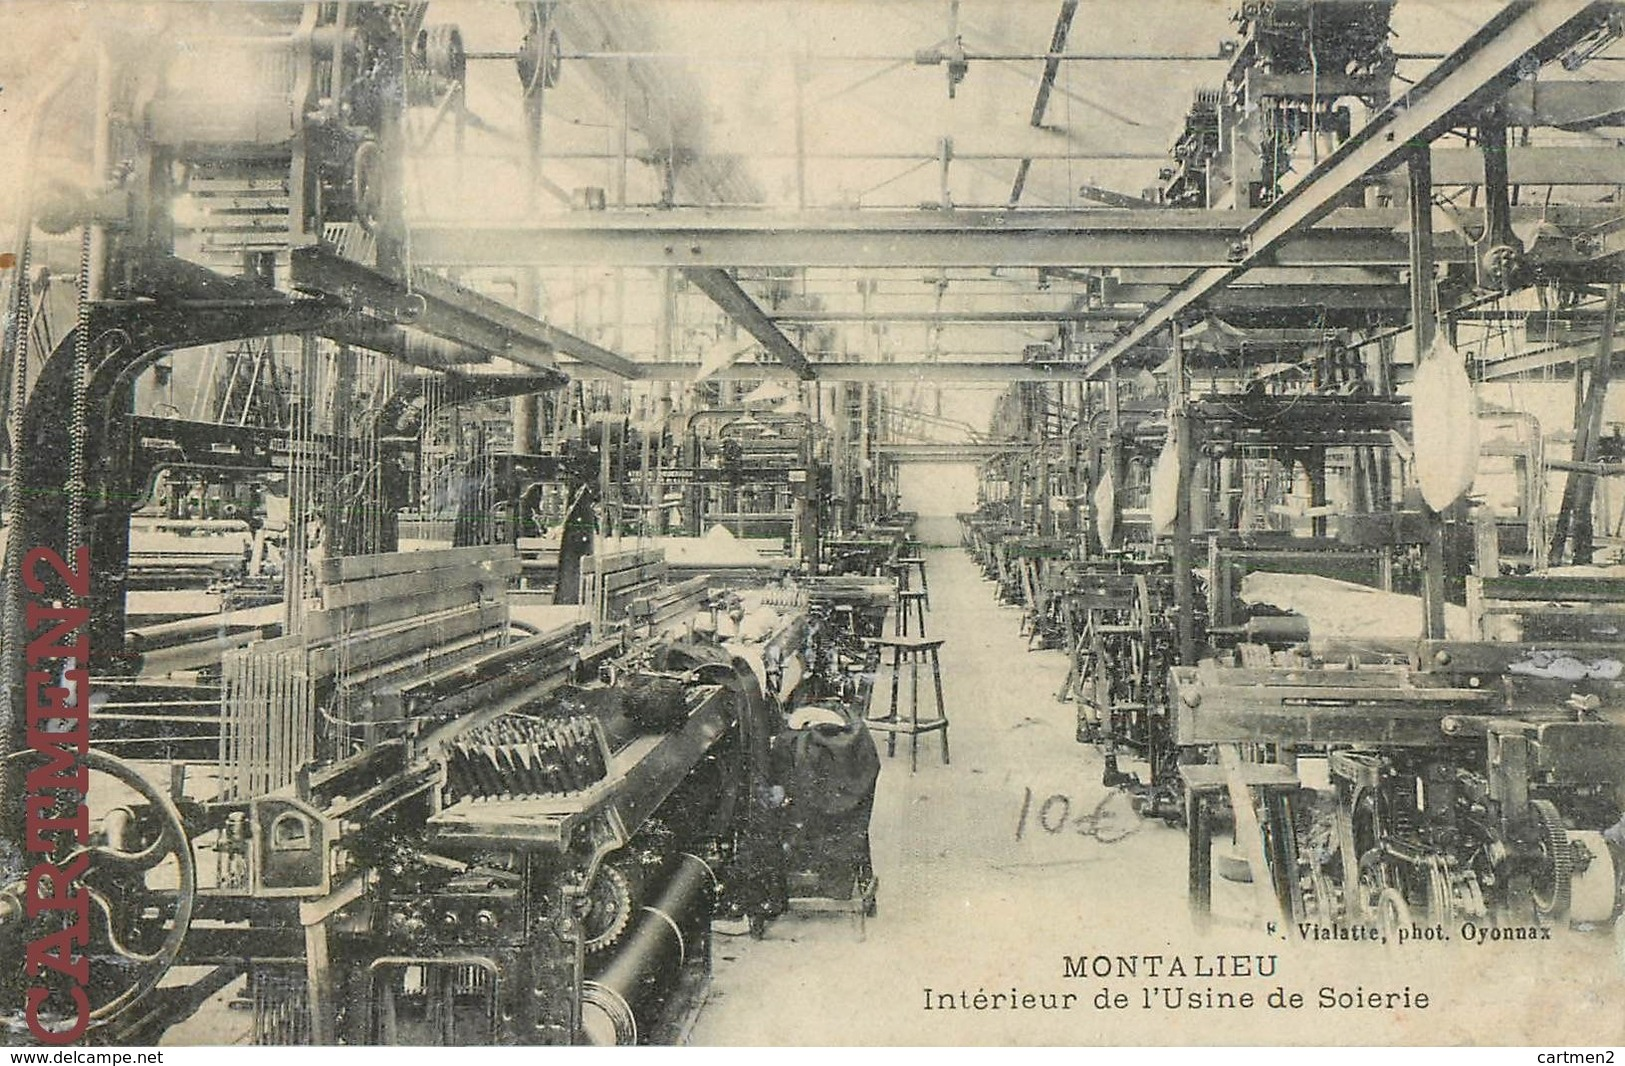 montalieu-interieur-de-lusine-de-soierie-metier-a-tisser-industrie-38-isere.jpg